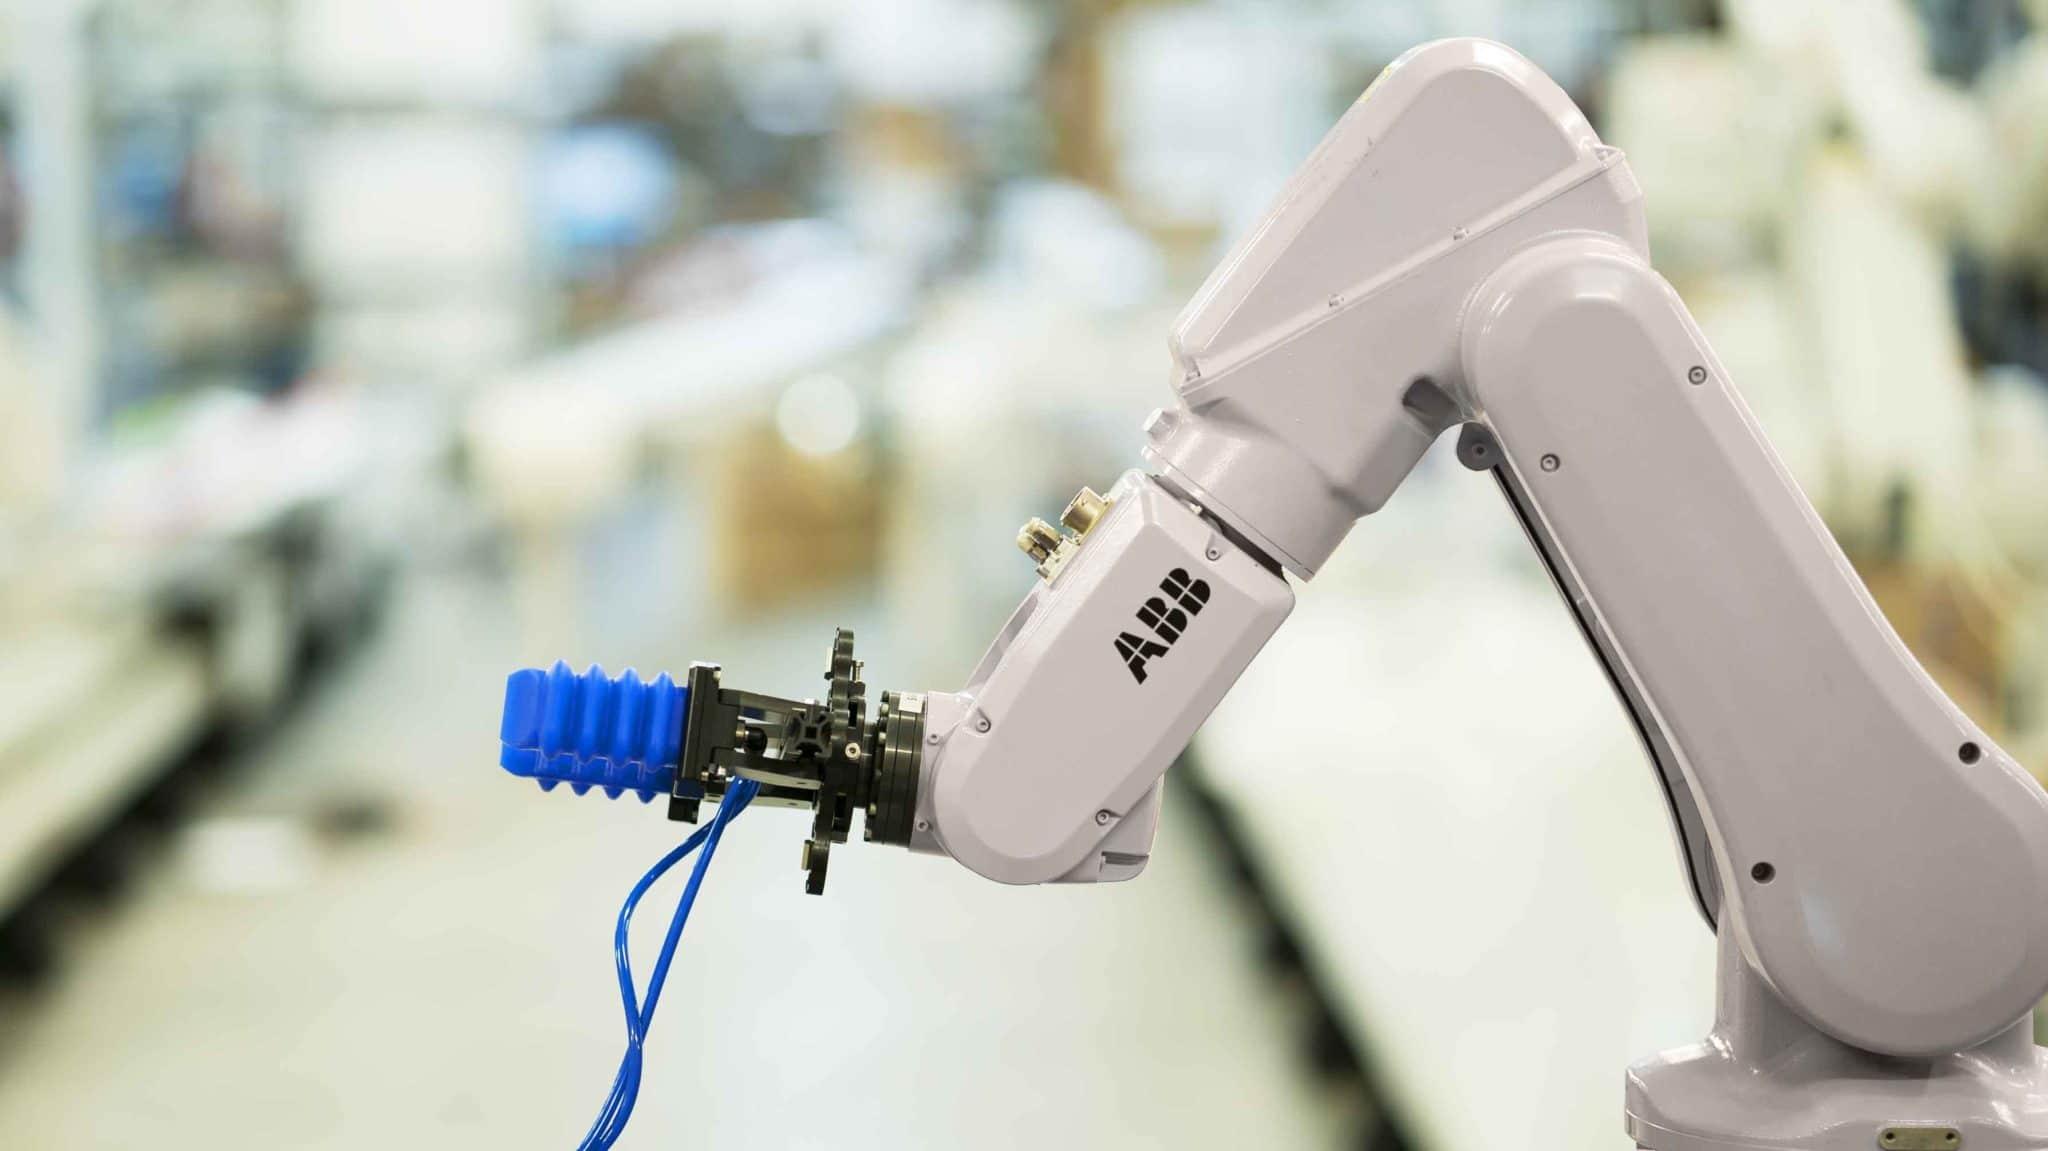 Cognex Insight Spreadsheet Tutorial Inside Training For Your Career In Robotics